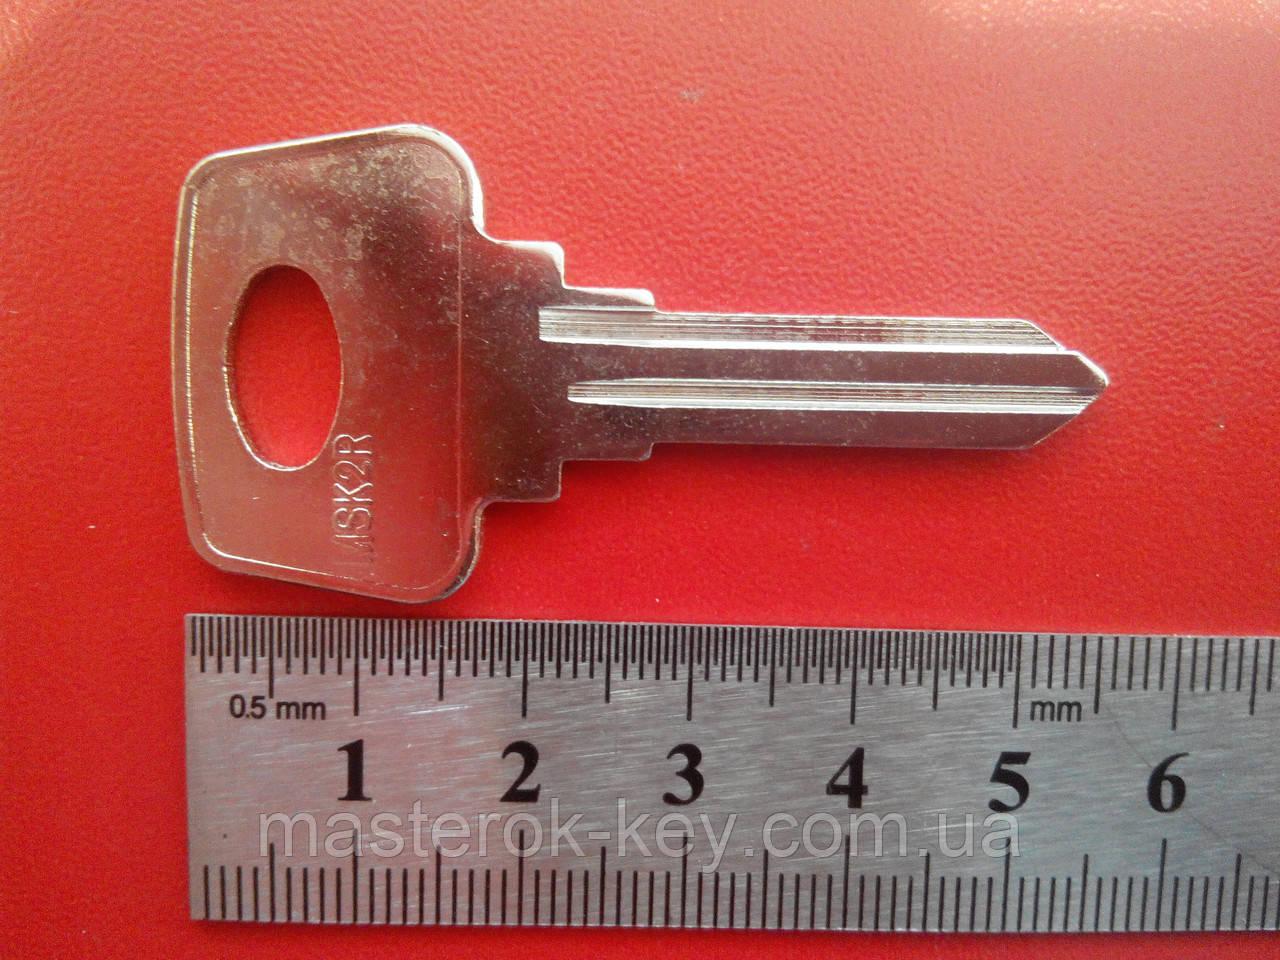 Заготовка автомобильного ключа МОСКВИЧ MSK-2R